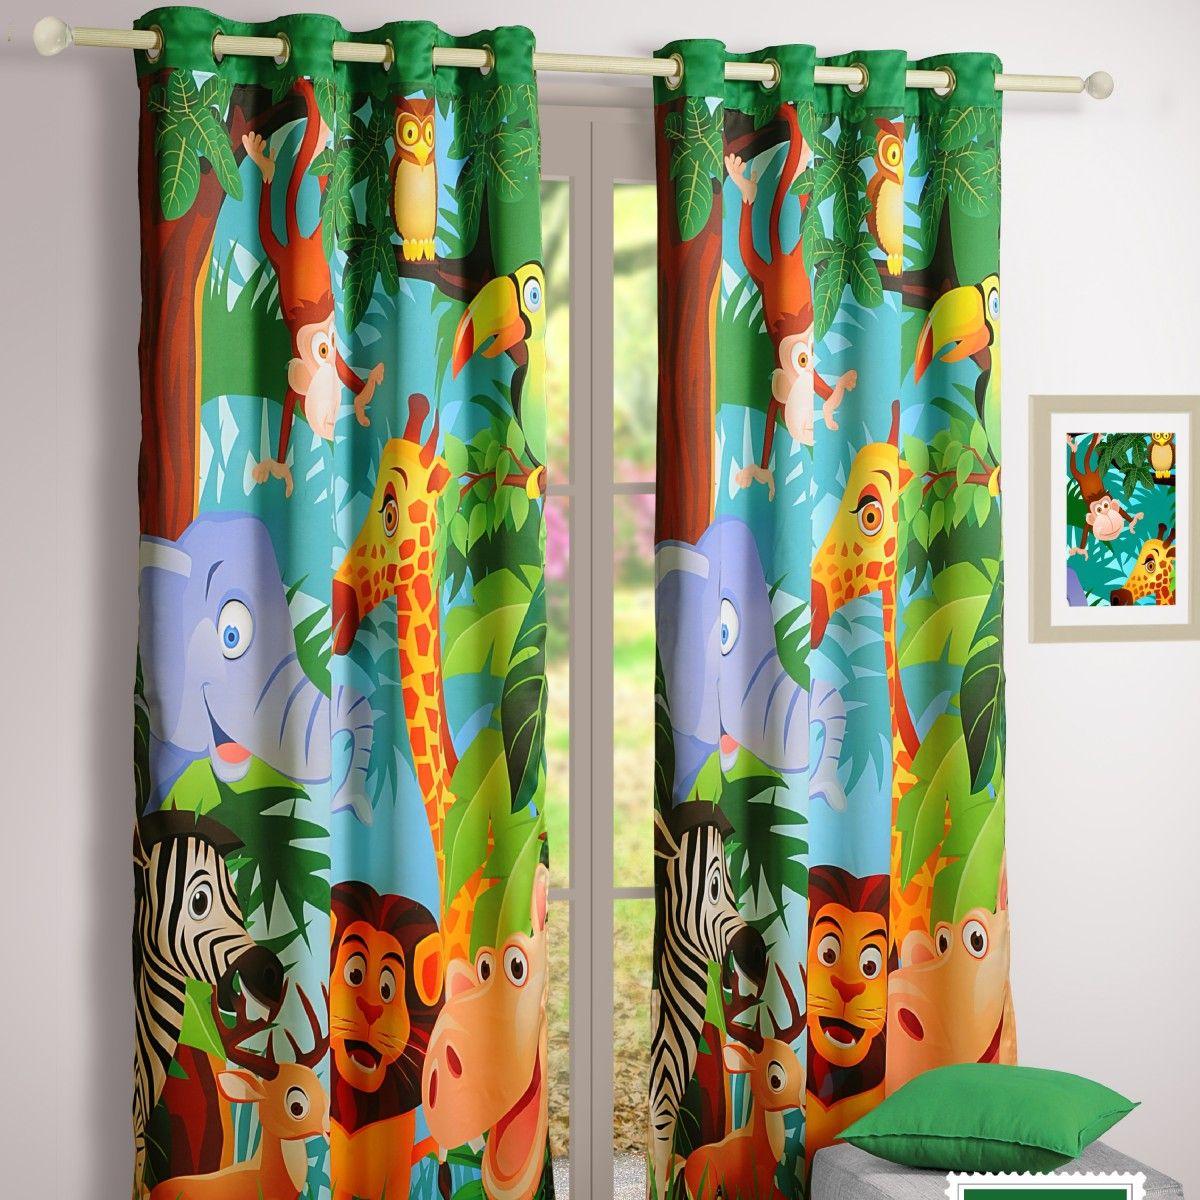 "Verdunkelungsvorhang "" Jungle Book Story"" Buy inhoma24"